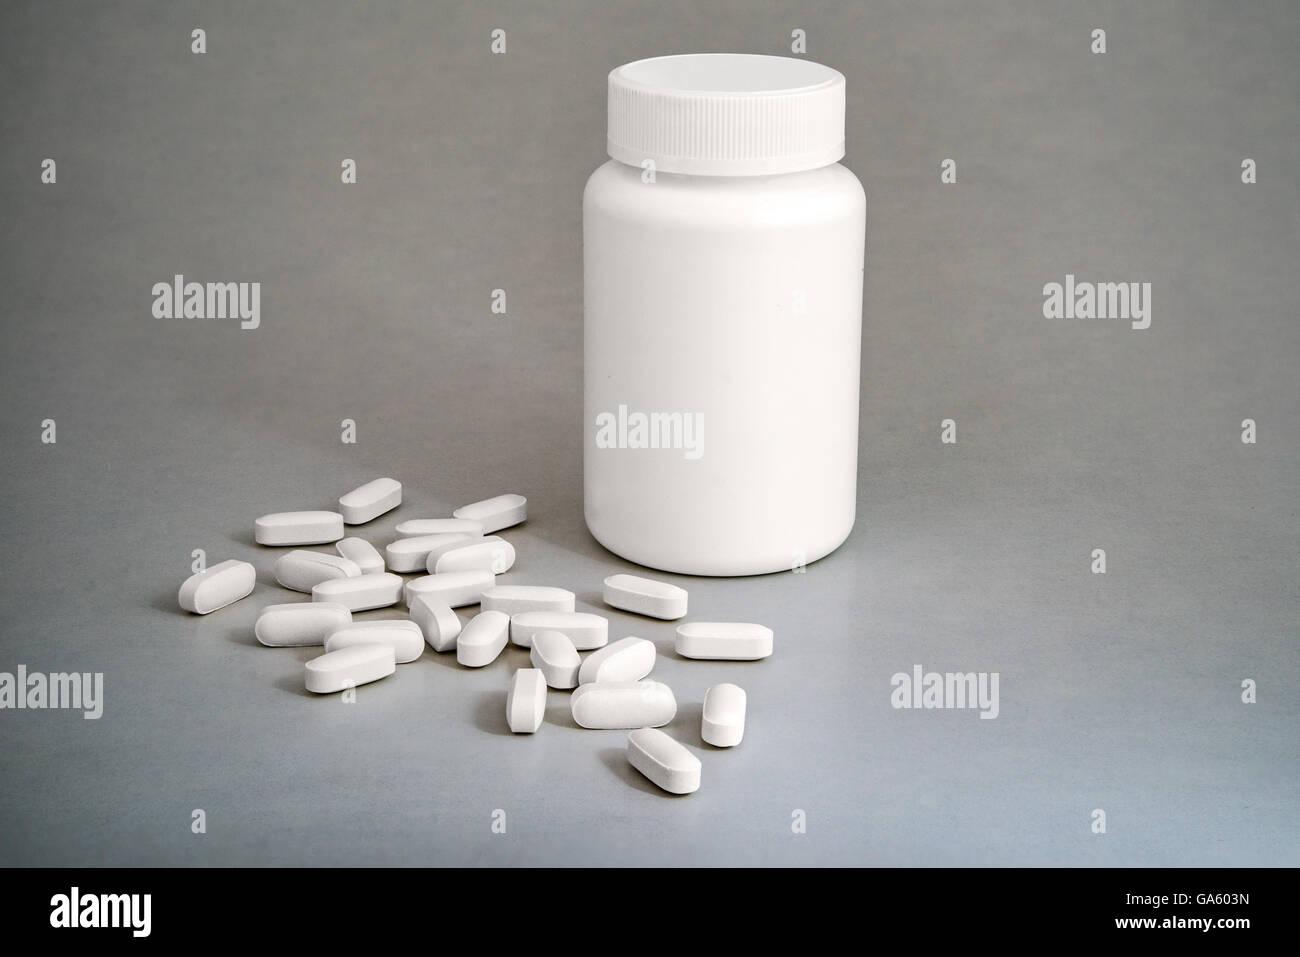 White plastic medicine bottle with white pills on gray background Stock Photo